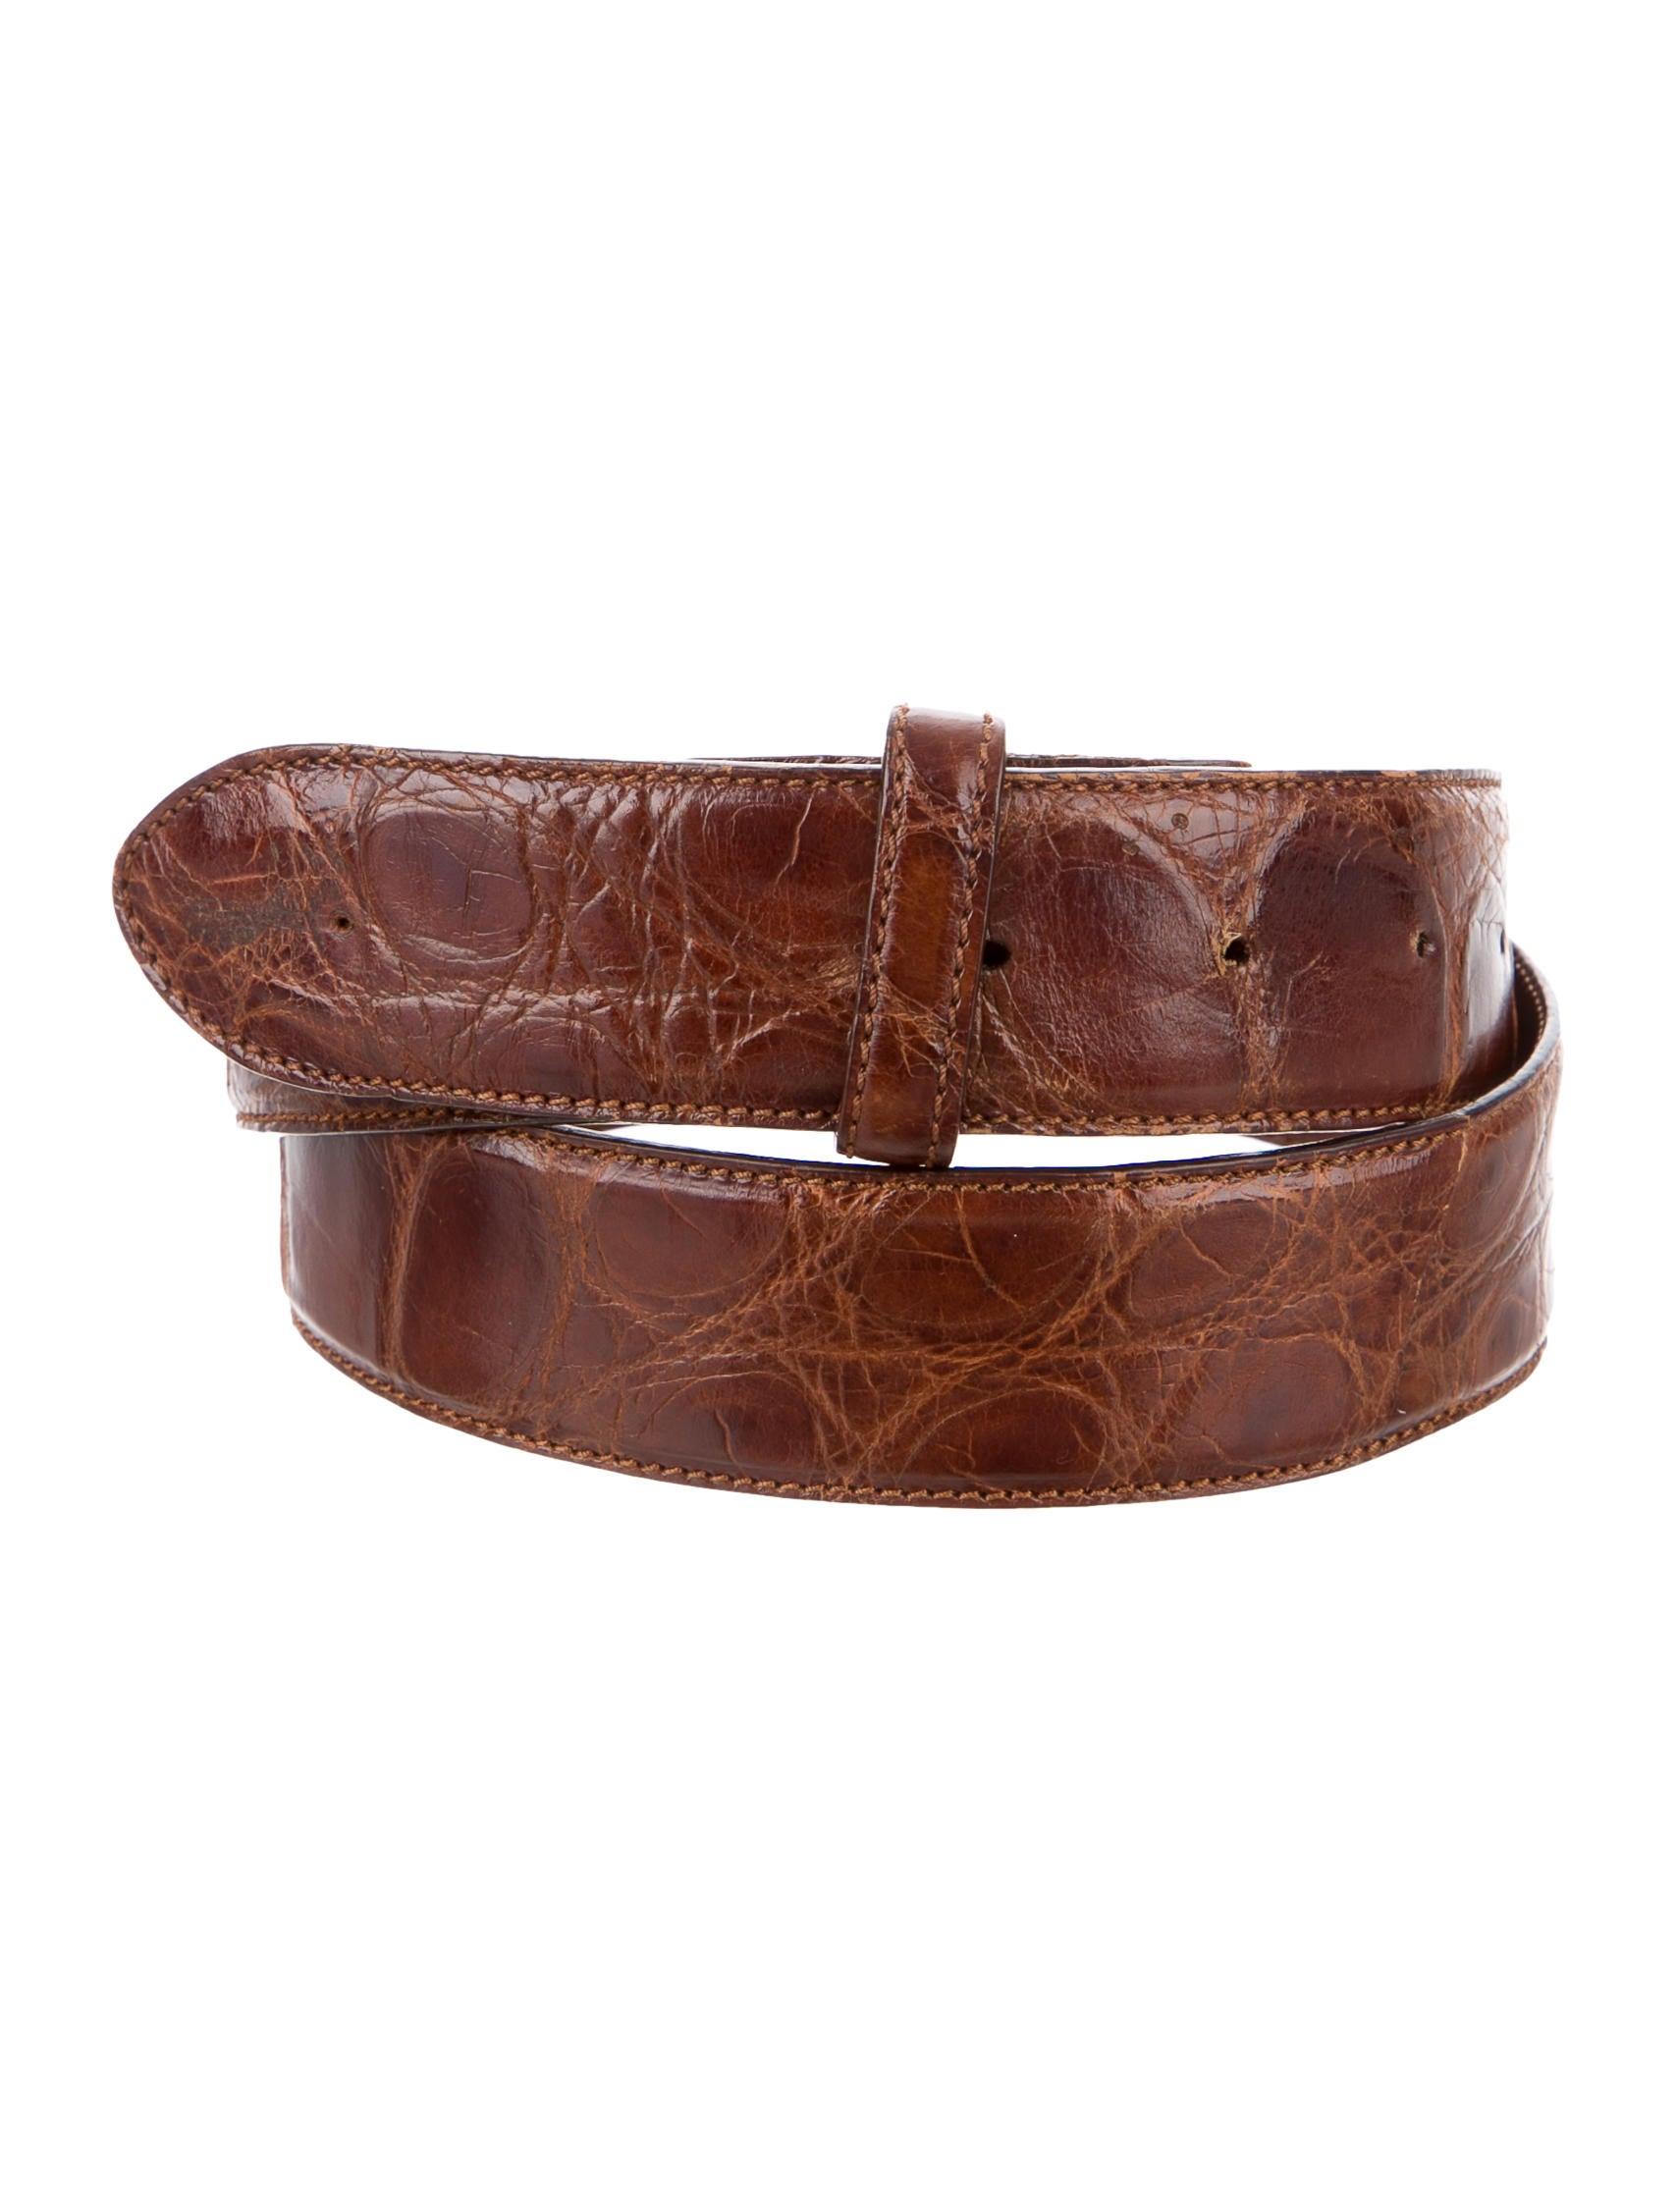 polo ralph lauren alligator belt strap accessories. Black Bedroom Furniture Sets. Home Design Ideas